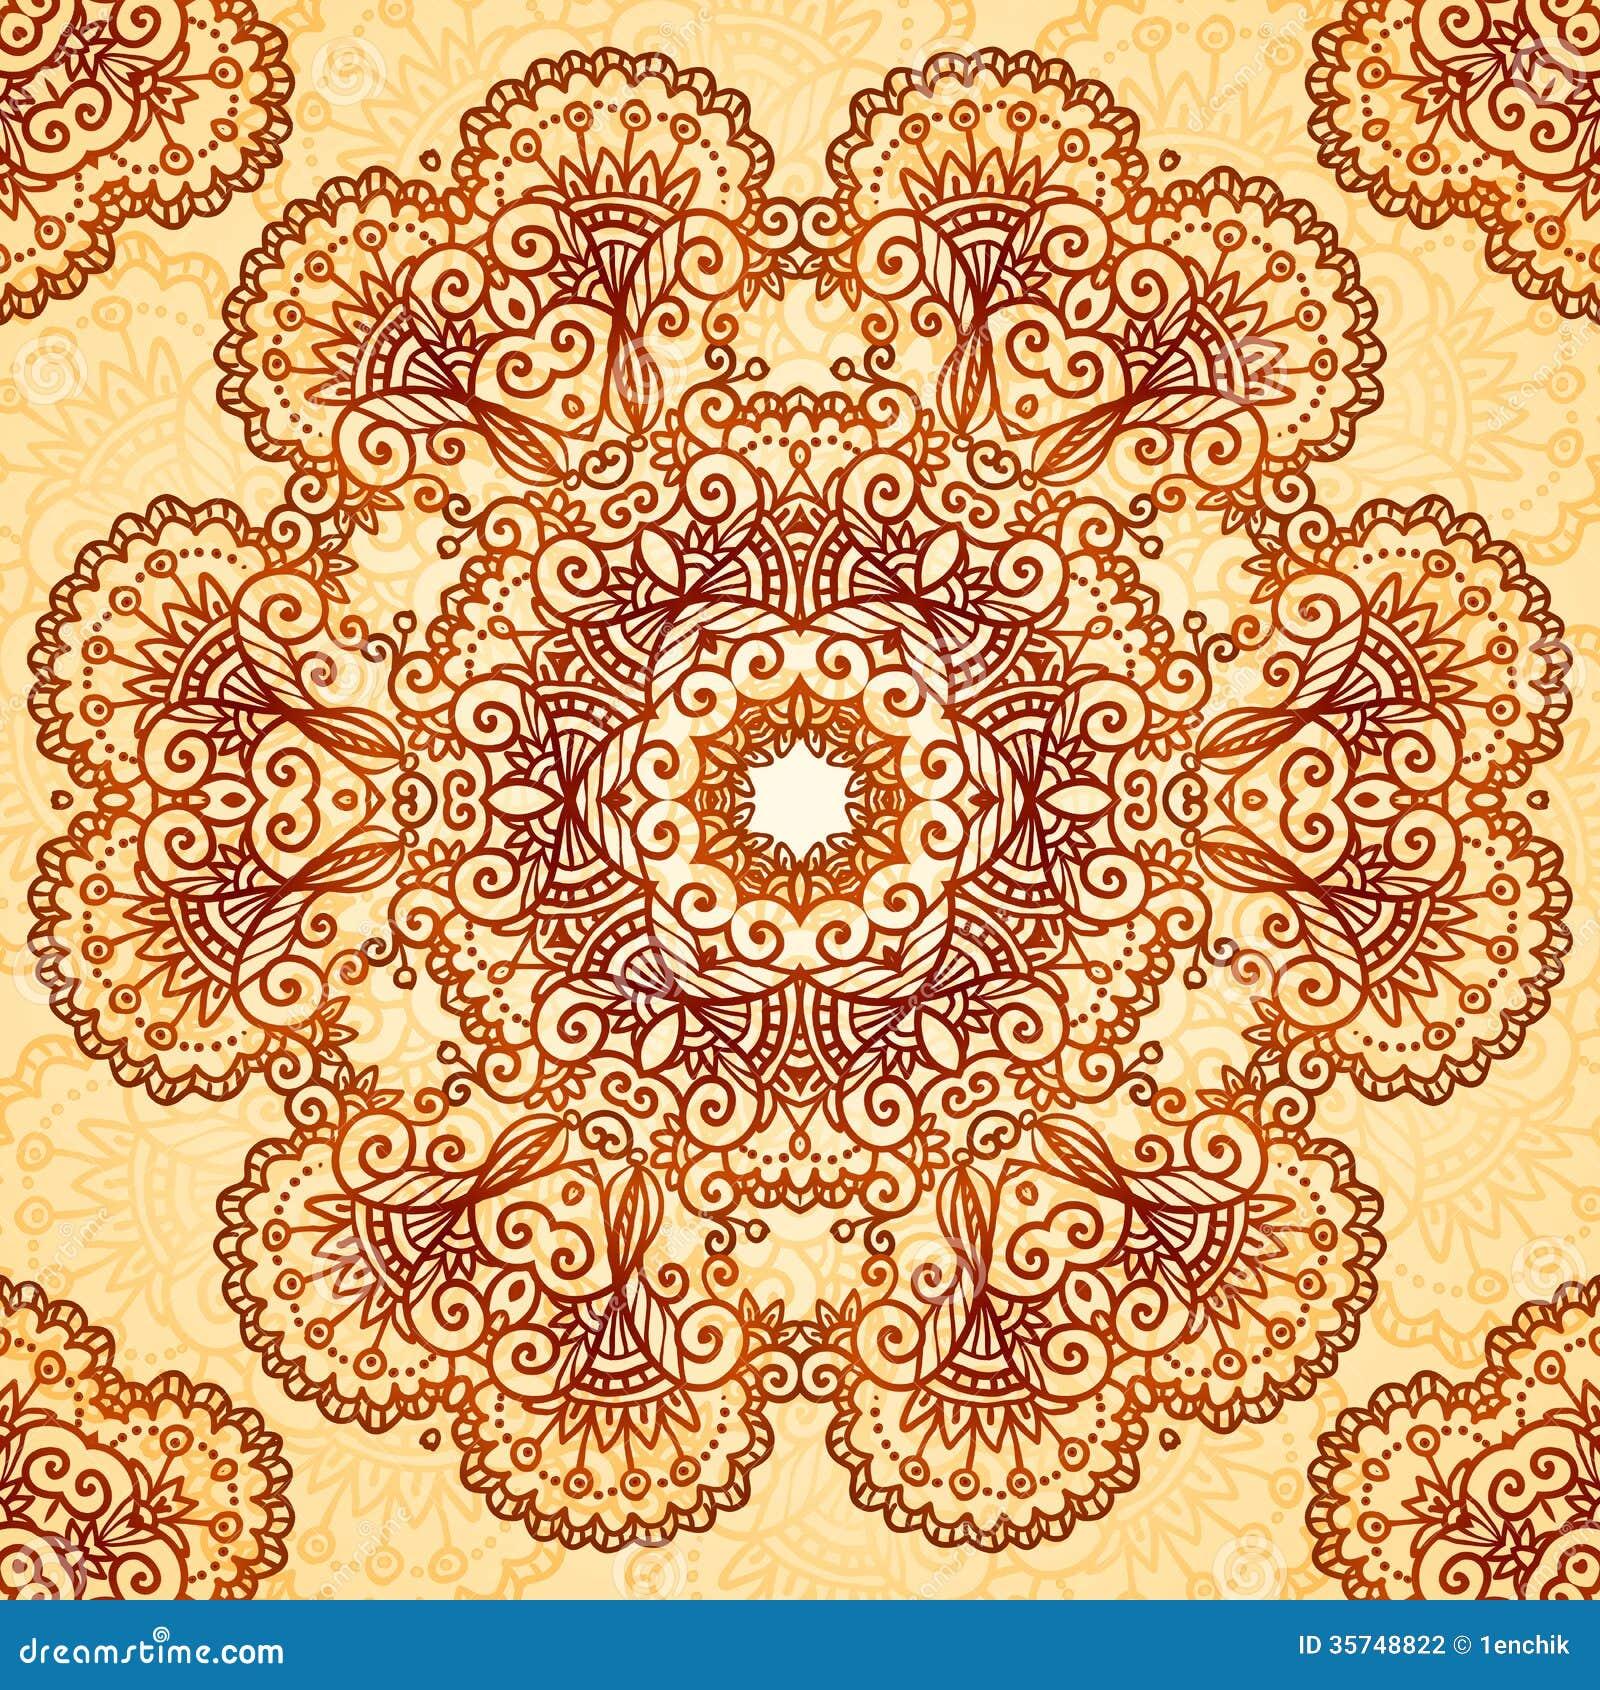 Ornate vintage vector background in mehndi style royalty free stock - Royalty Free Stock Photo Circle Mehndi Pattern Seamless Style Vintage